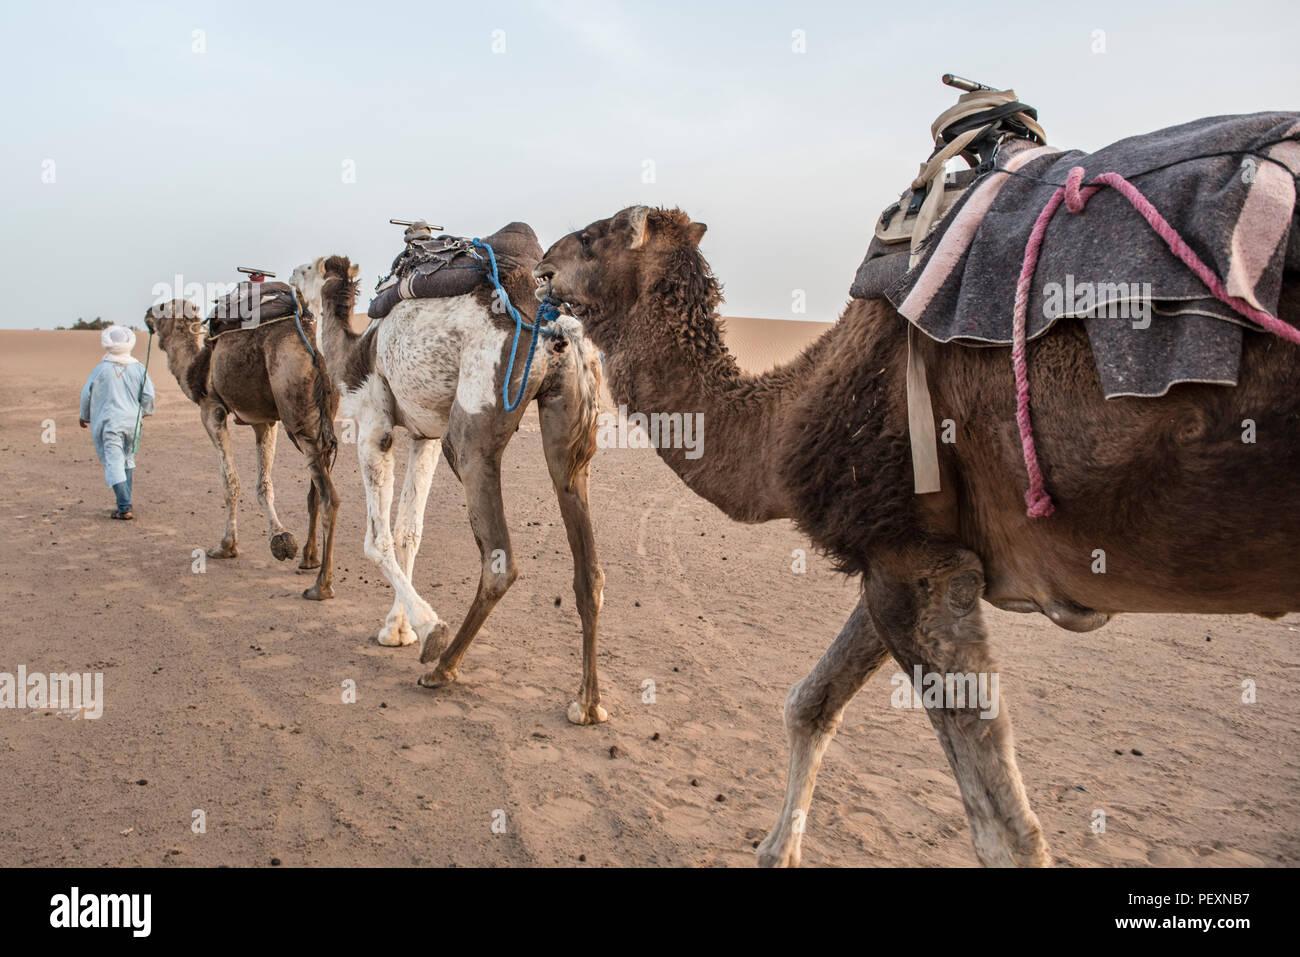 Camel train in Sahara Desert, Merzouga, Morocco - Stock Image